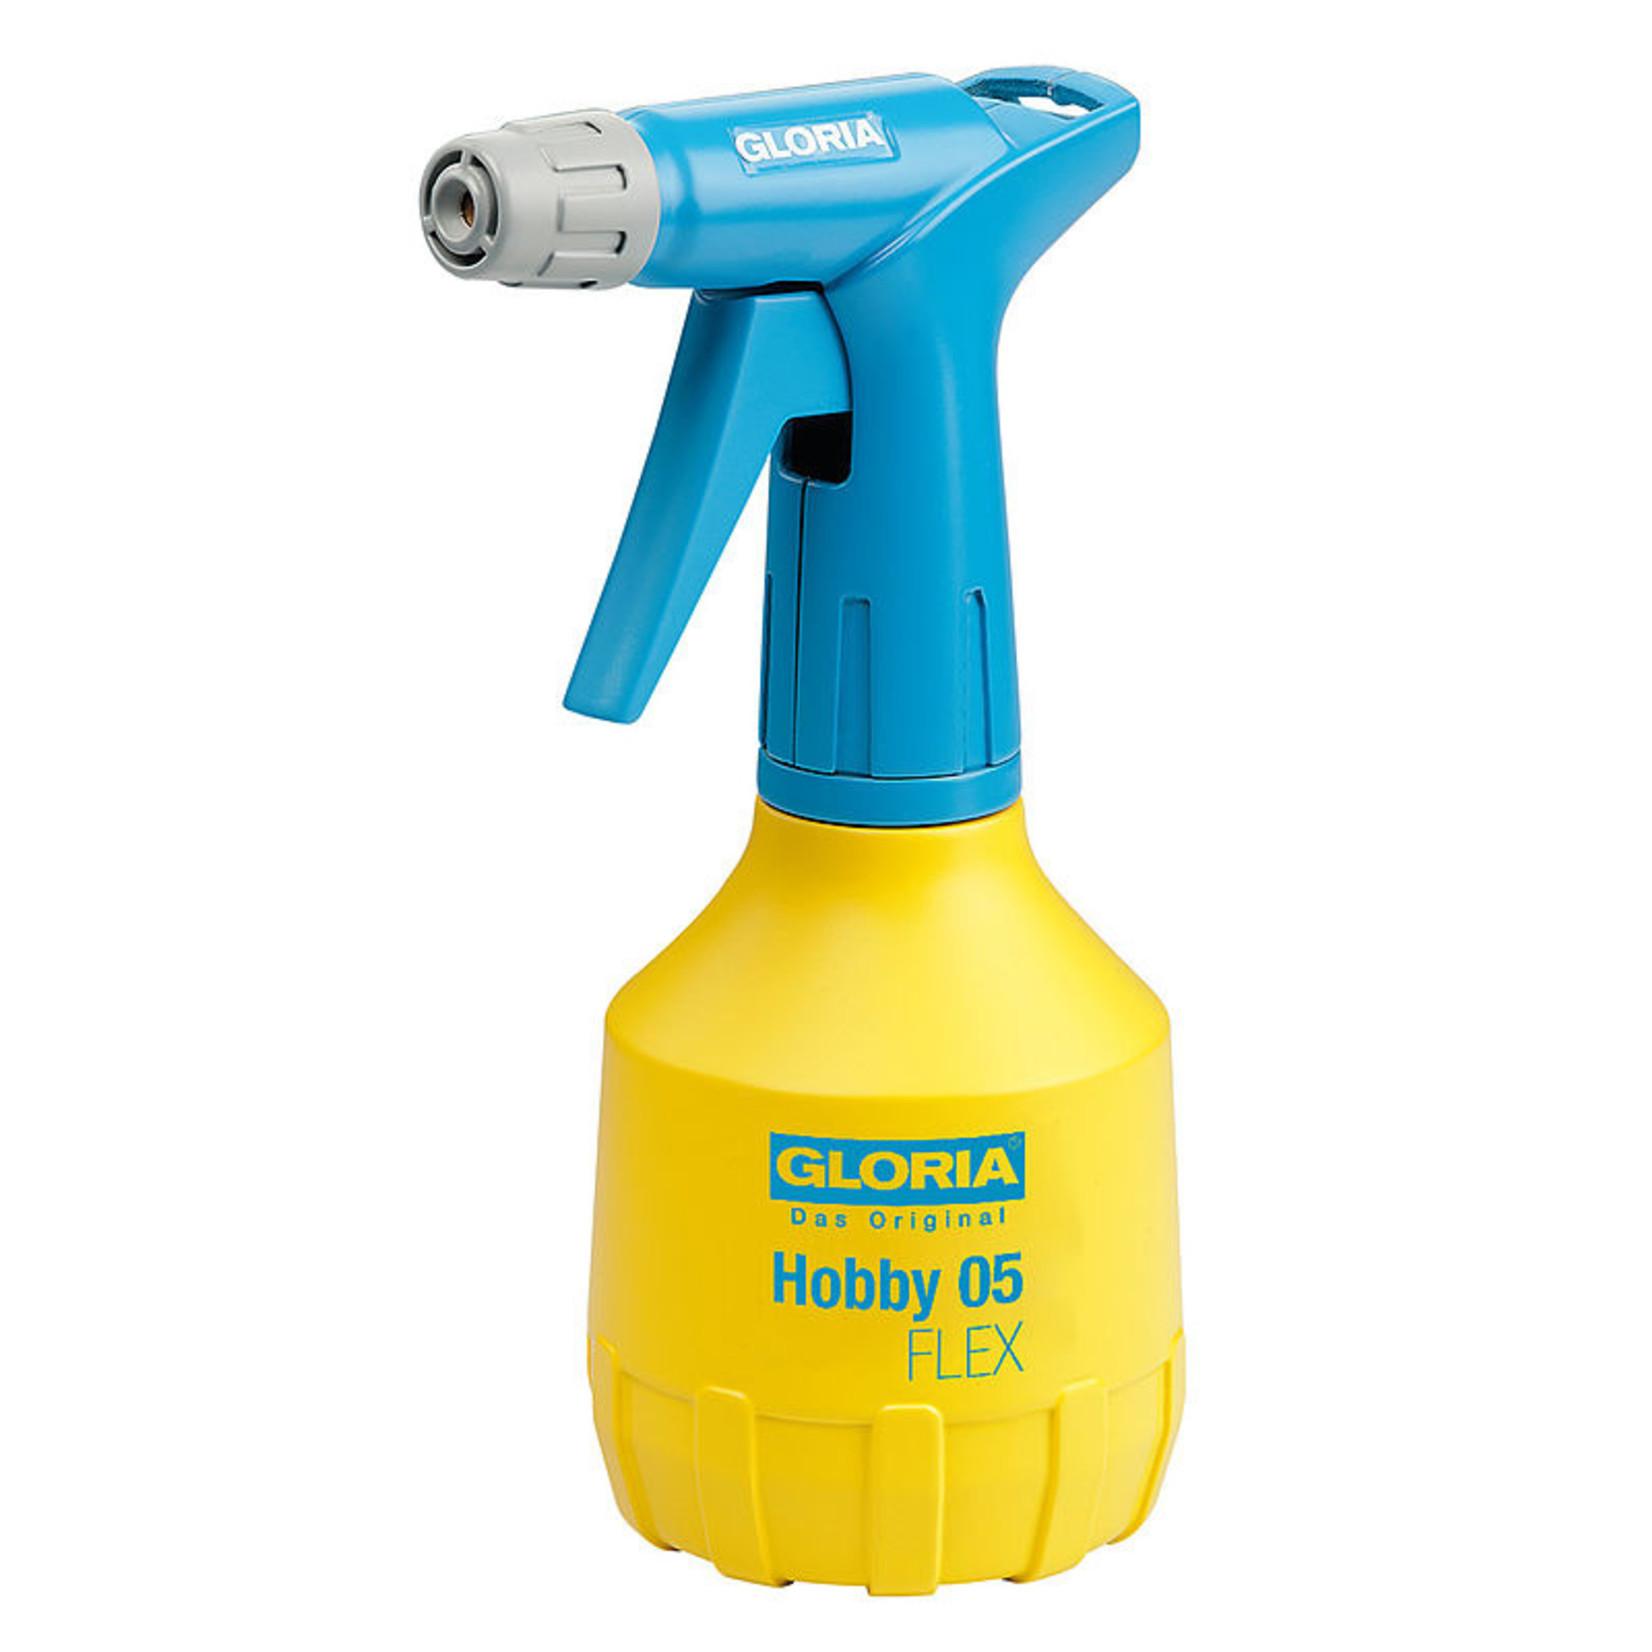 Gloria Fijnsproeier Hobby 05 FLEX 360° (0,5 liter)